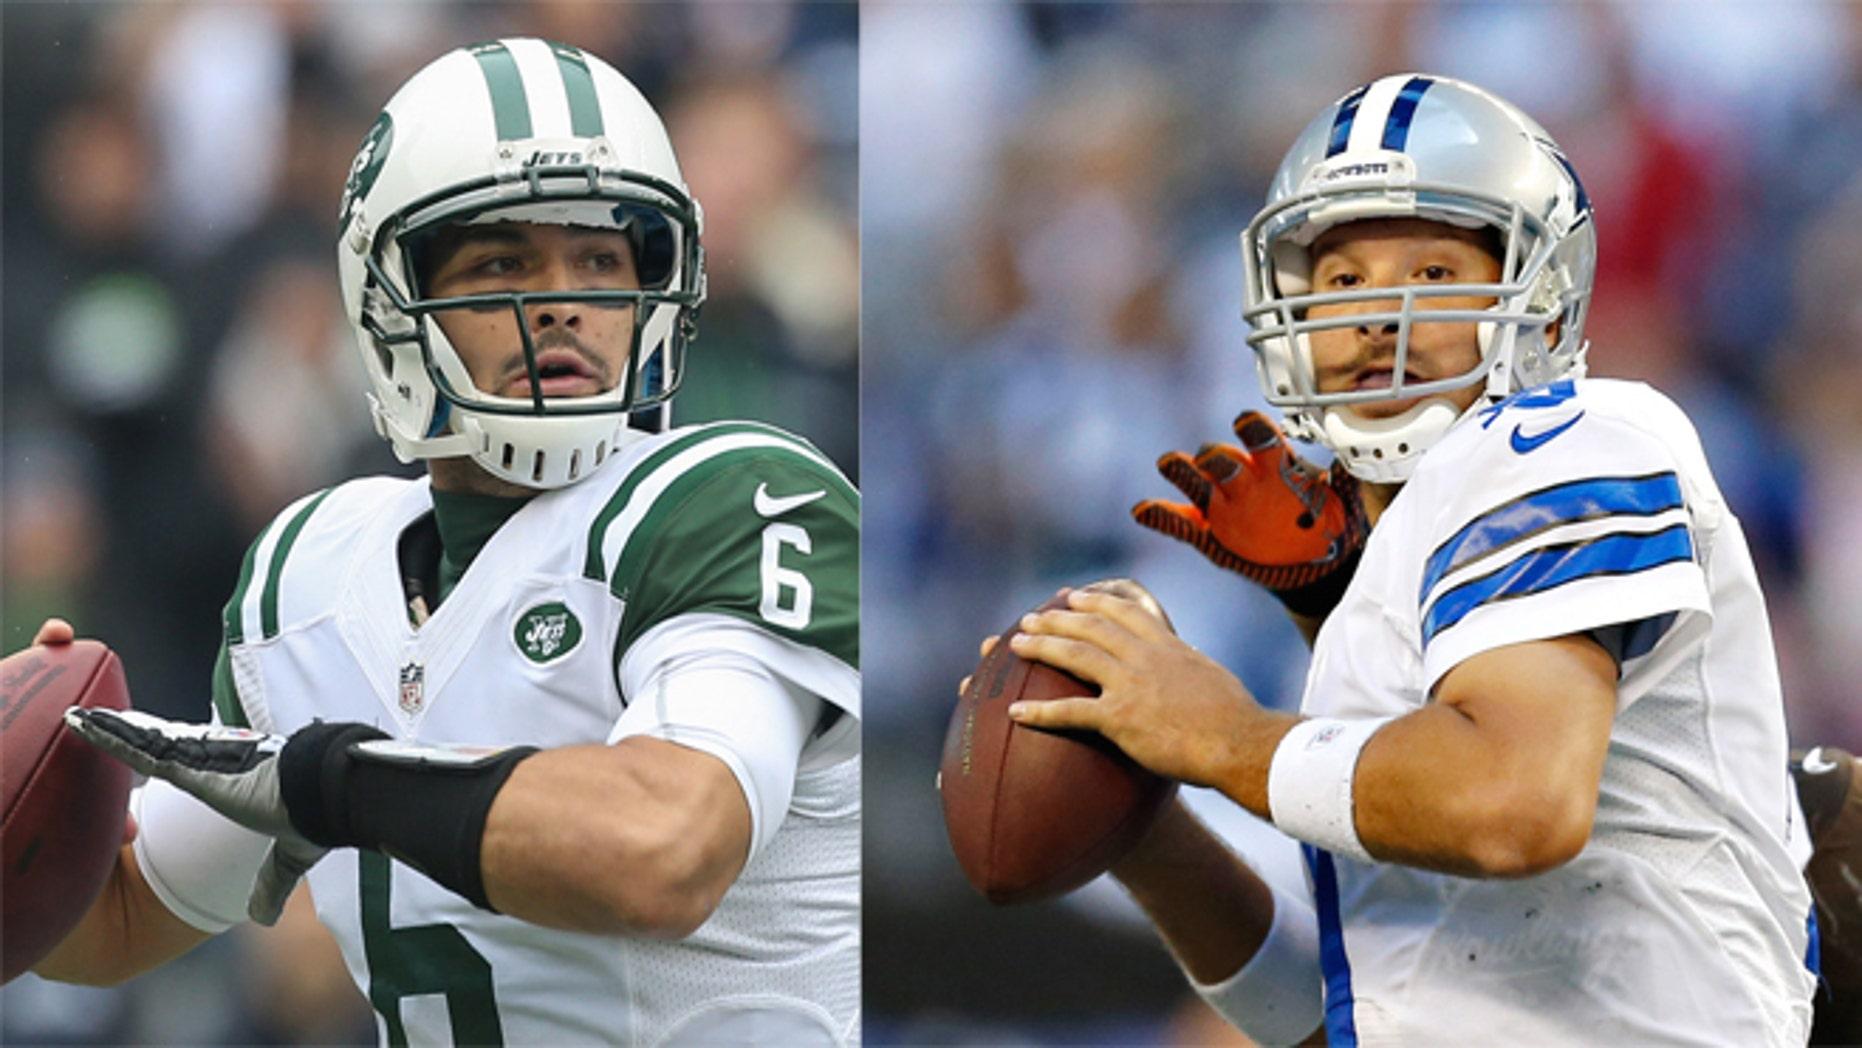 Latinos quarterbacks Mark Sanchez (L) of the New York Jets and Tony Rom (R) of the Dallas Cowboys